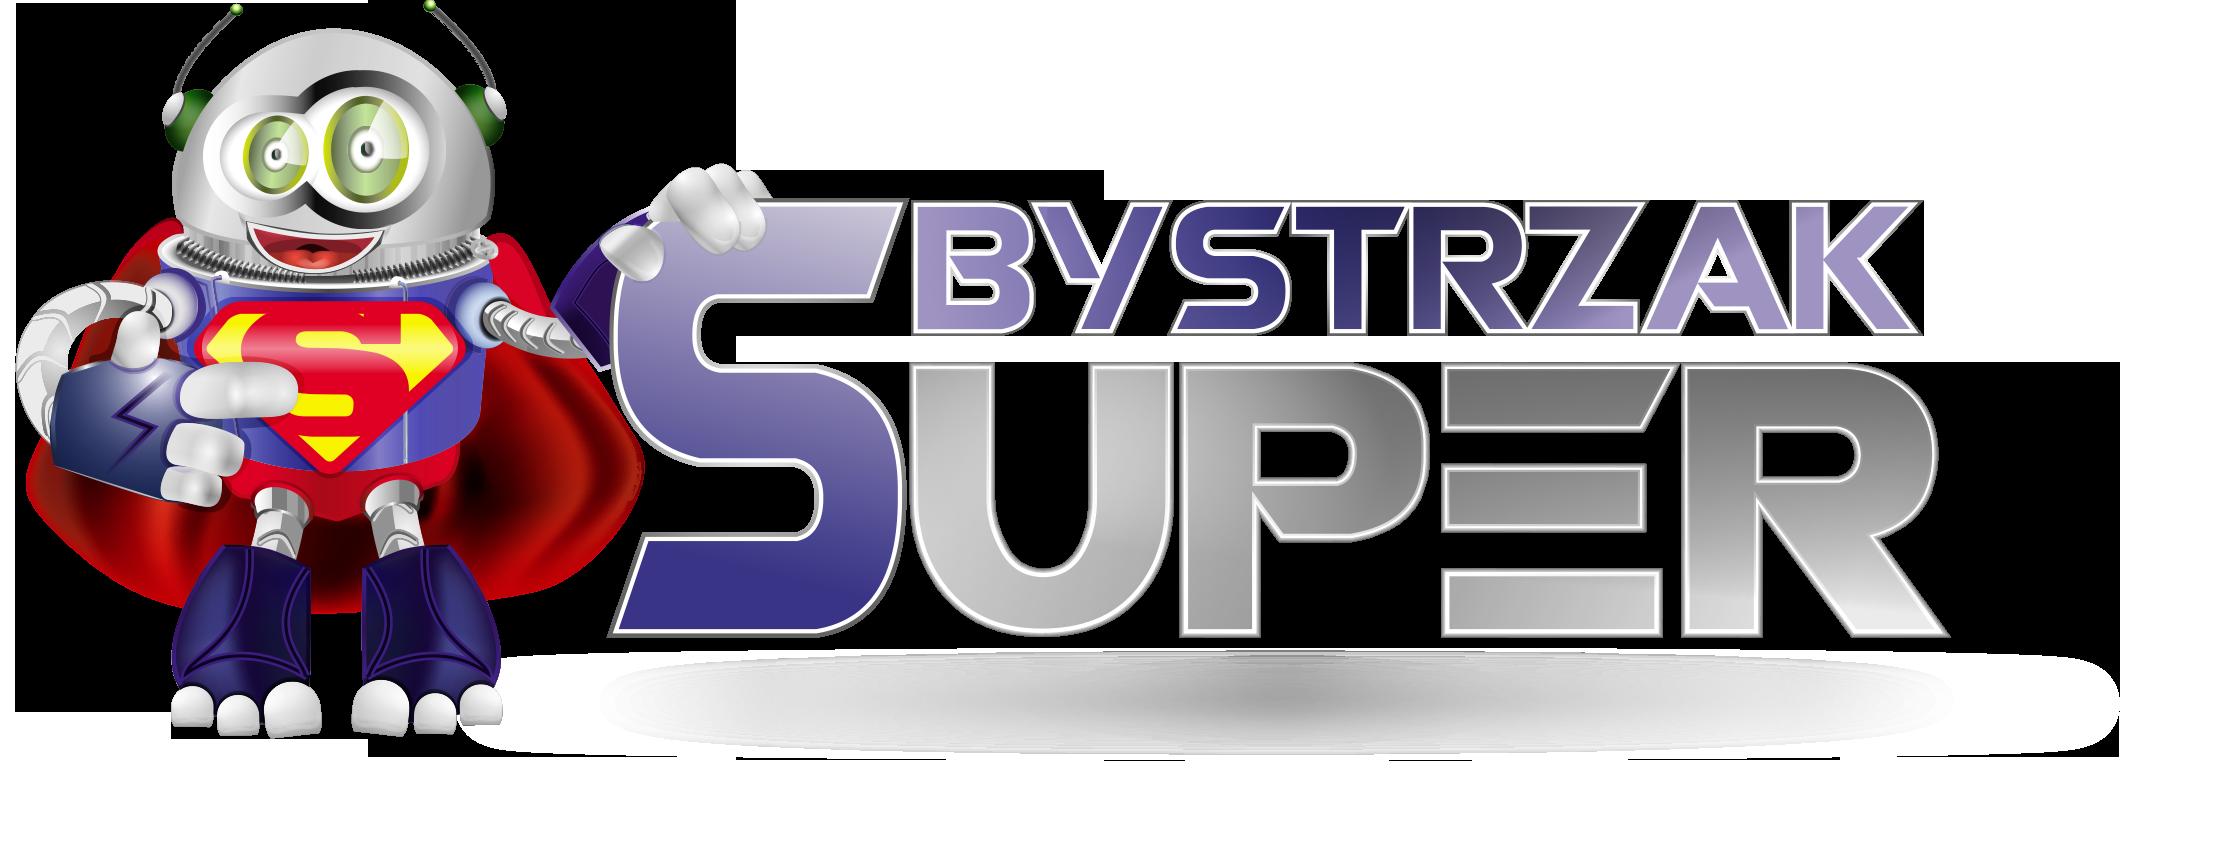 SuperBystrzak